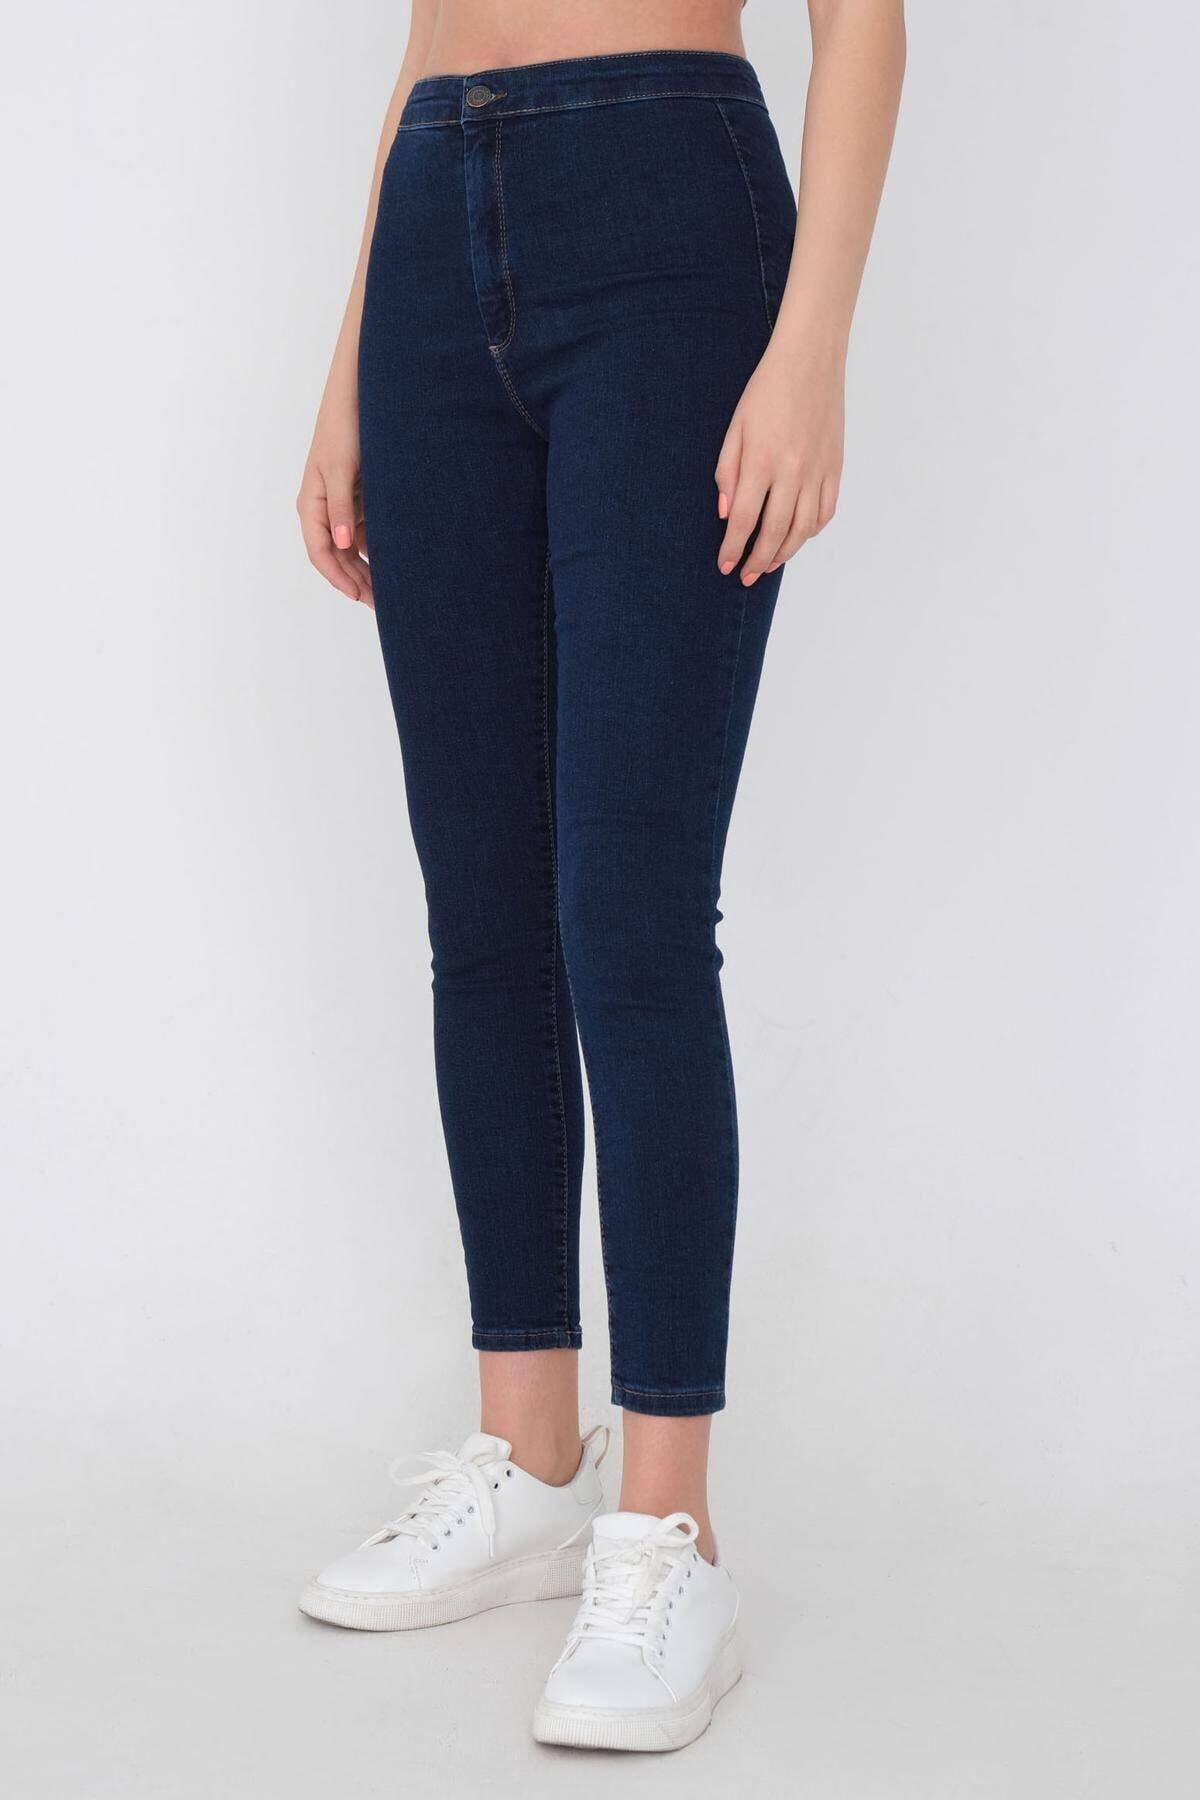 Addax Kadın Koyu Kot Rengi Yüksek Bel Pantolon Pn11178 - Pnu ADX-0000016107 1